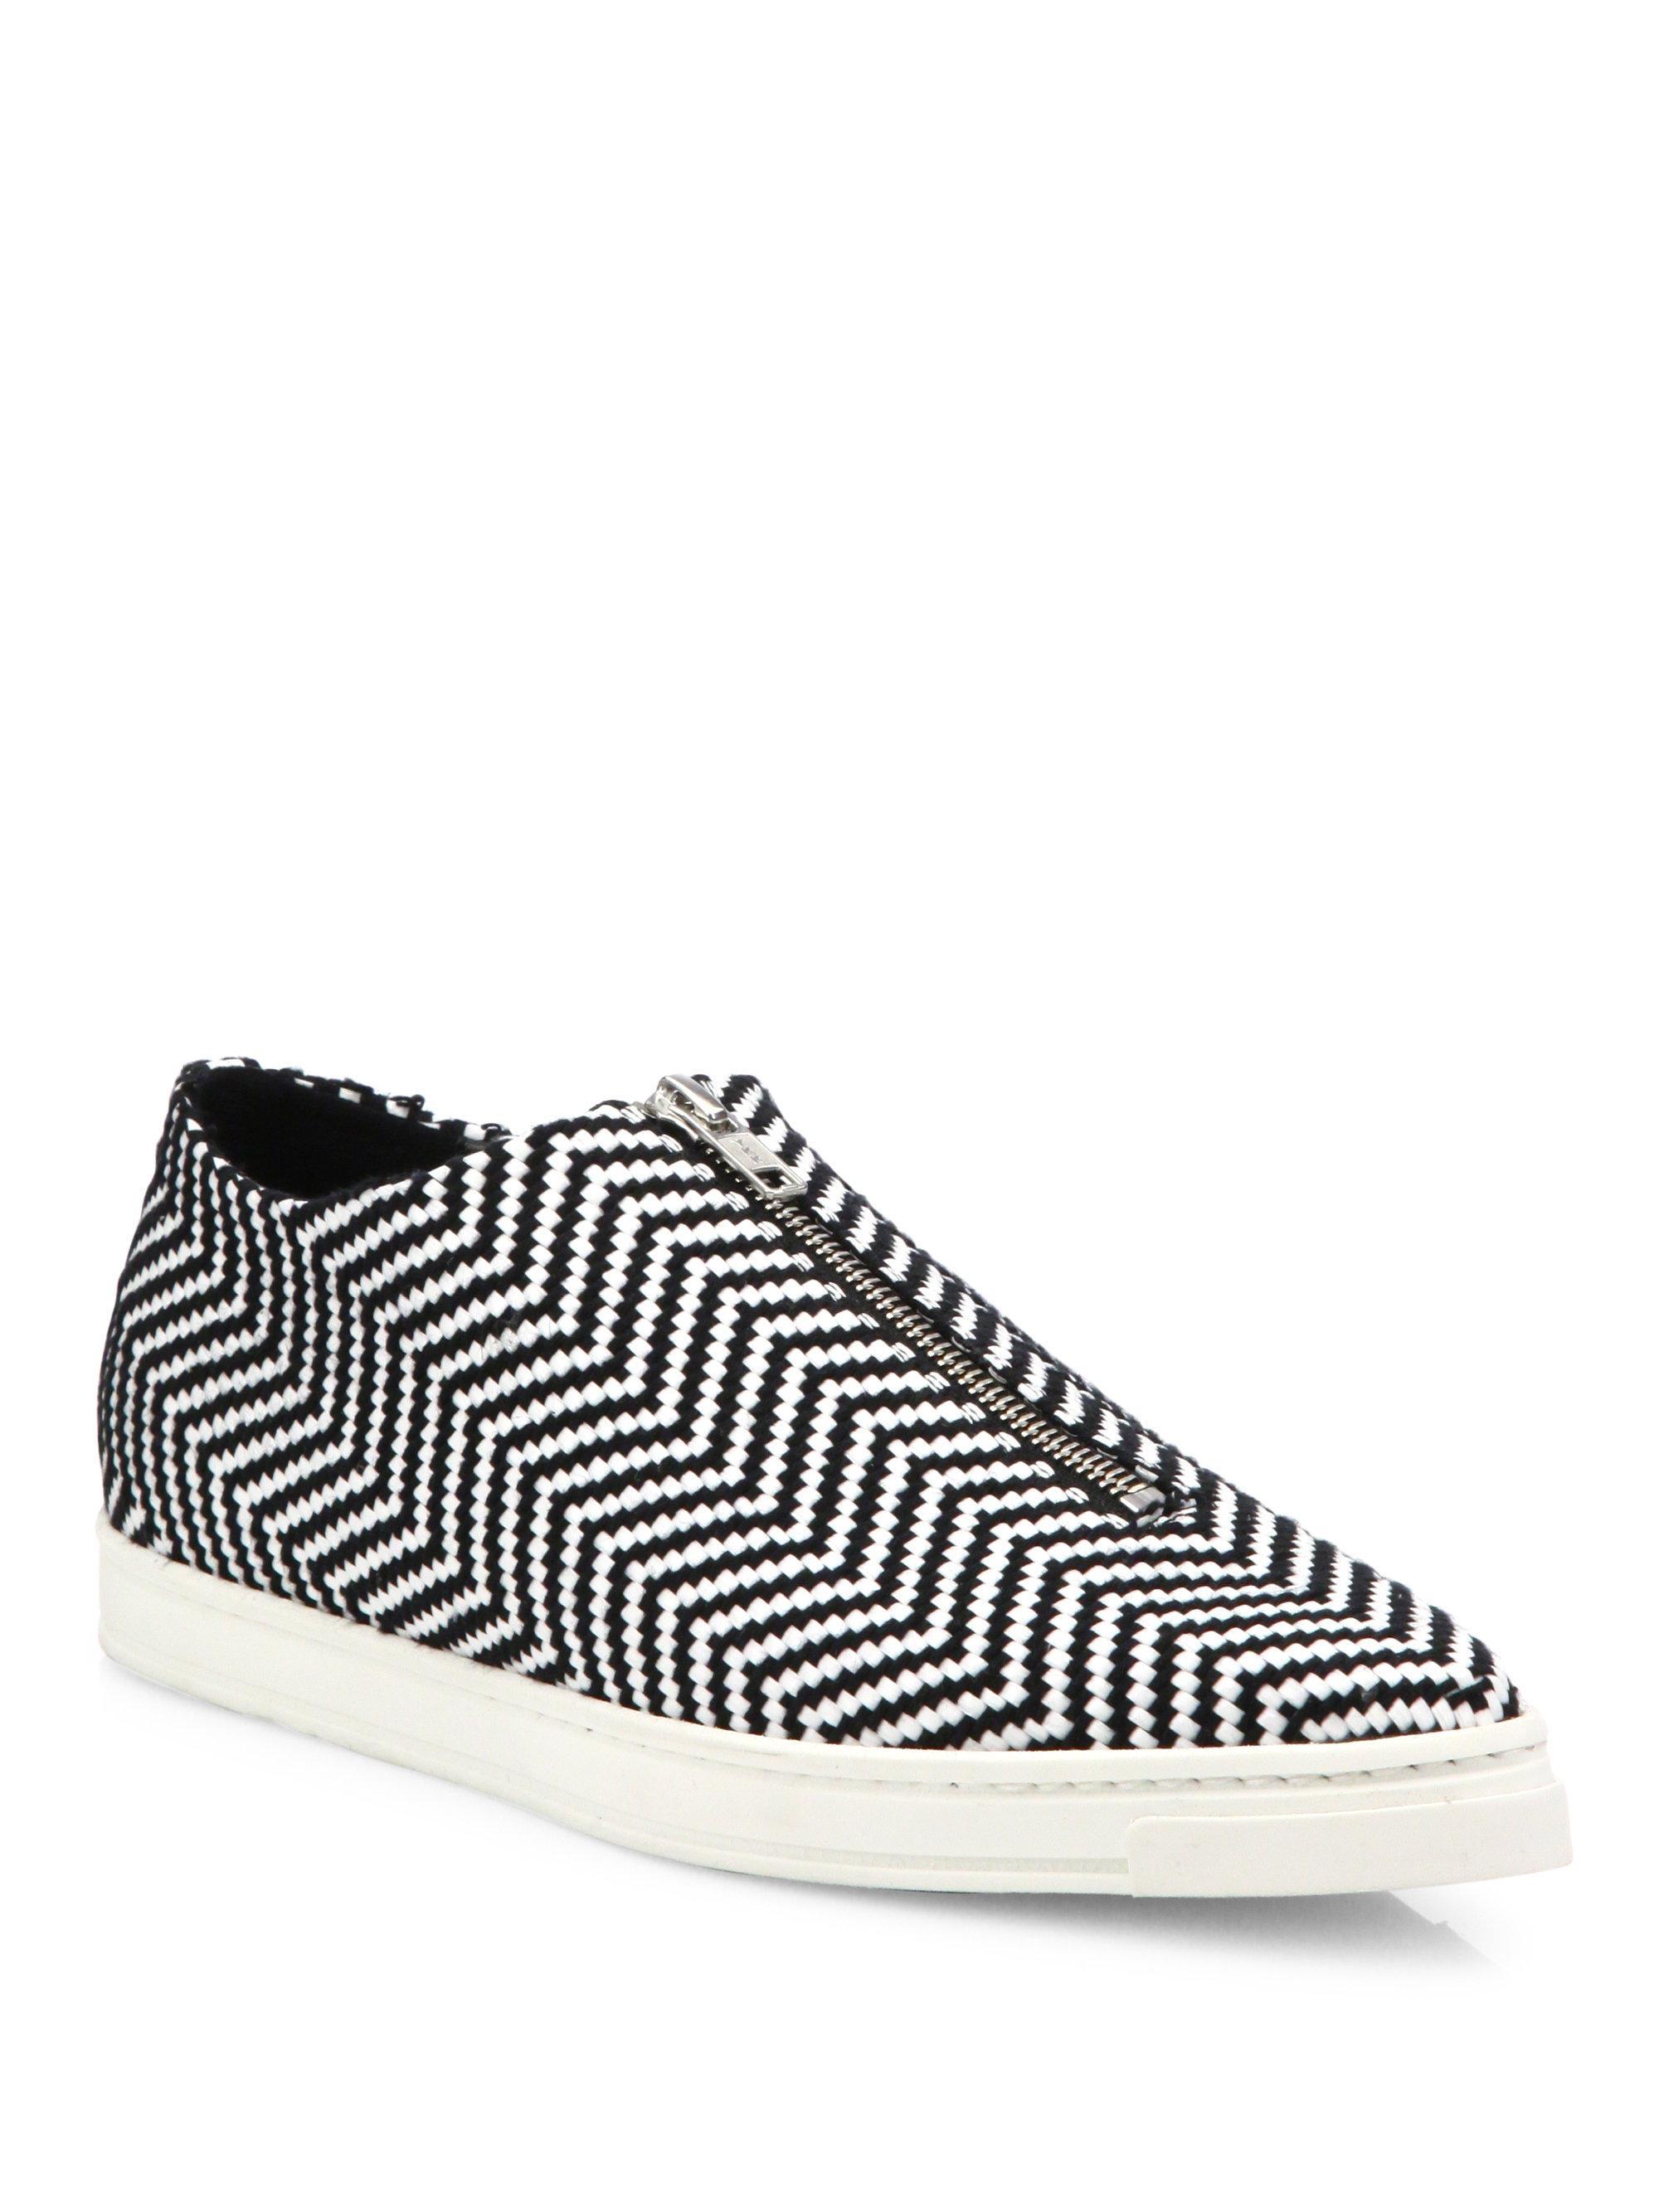 Stella McCartney Sligo Zigzag Zip-Front Sneakers rqmLe0